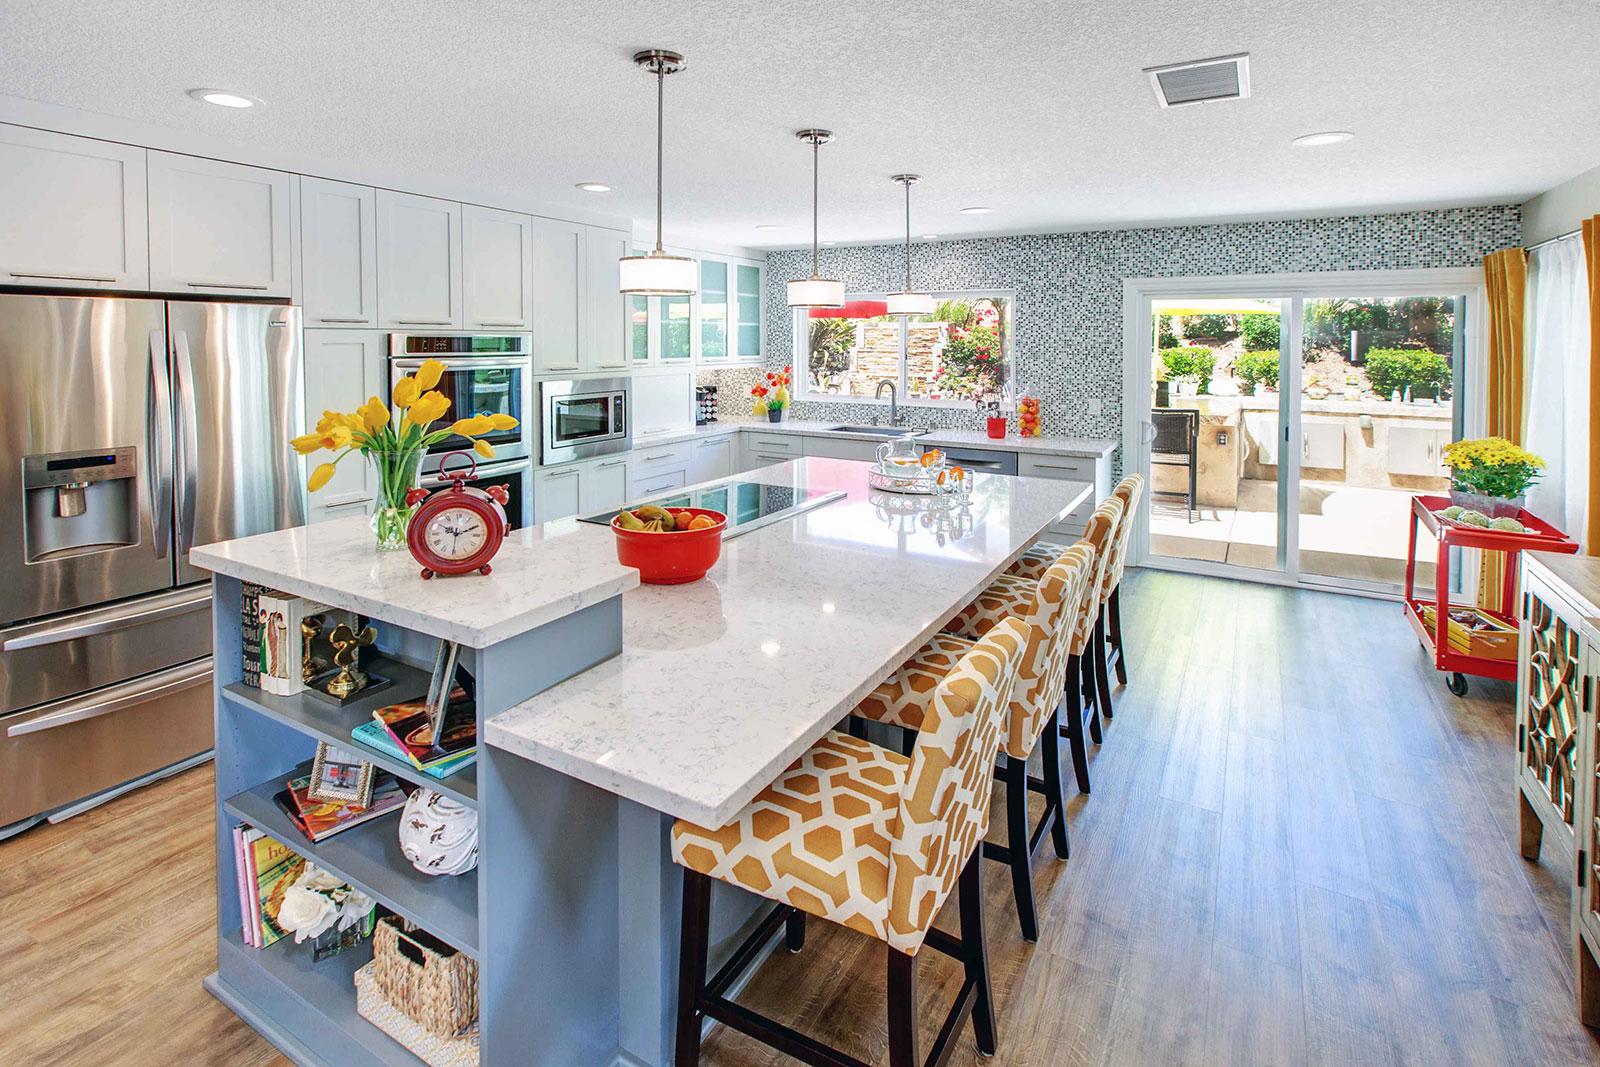 A Silestone quartz kitchen counter